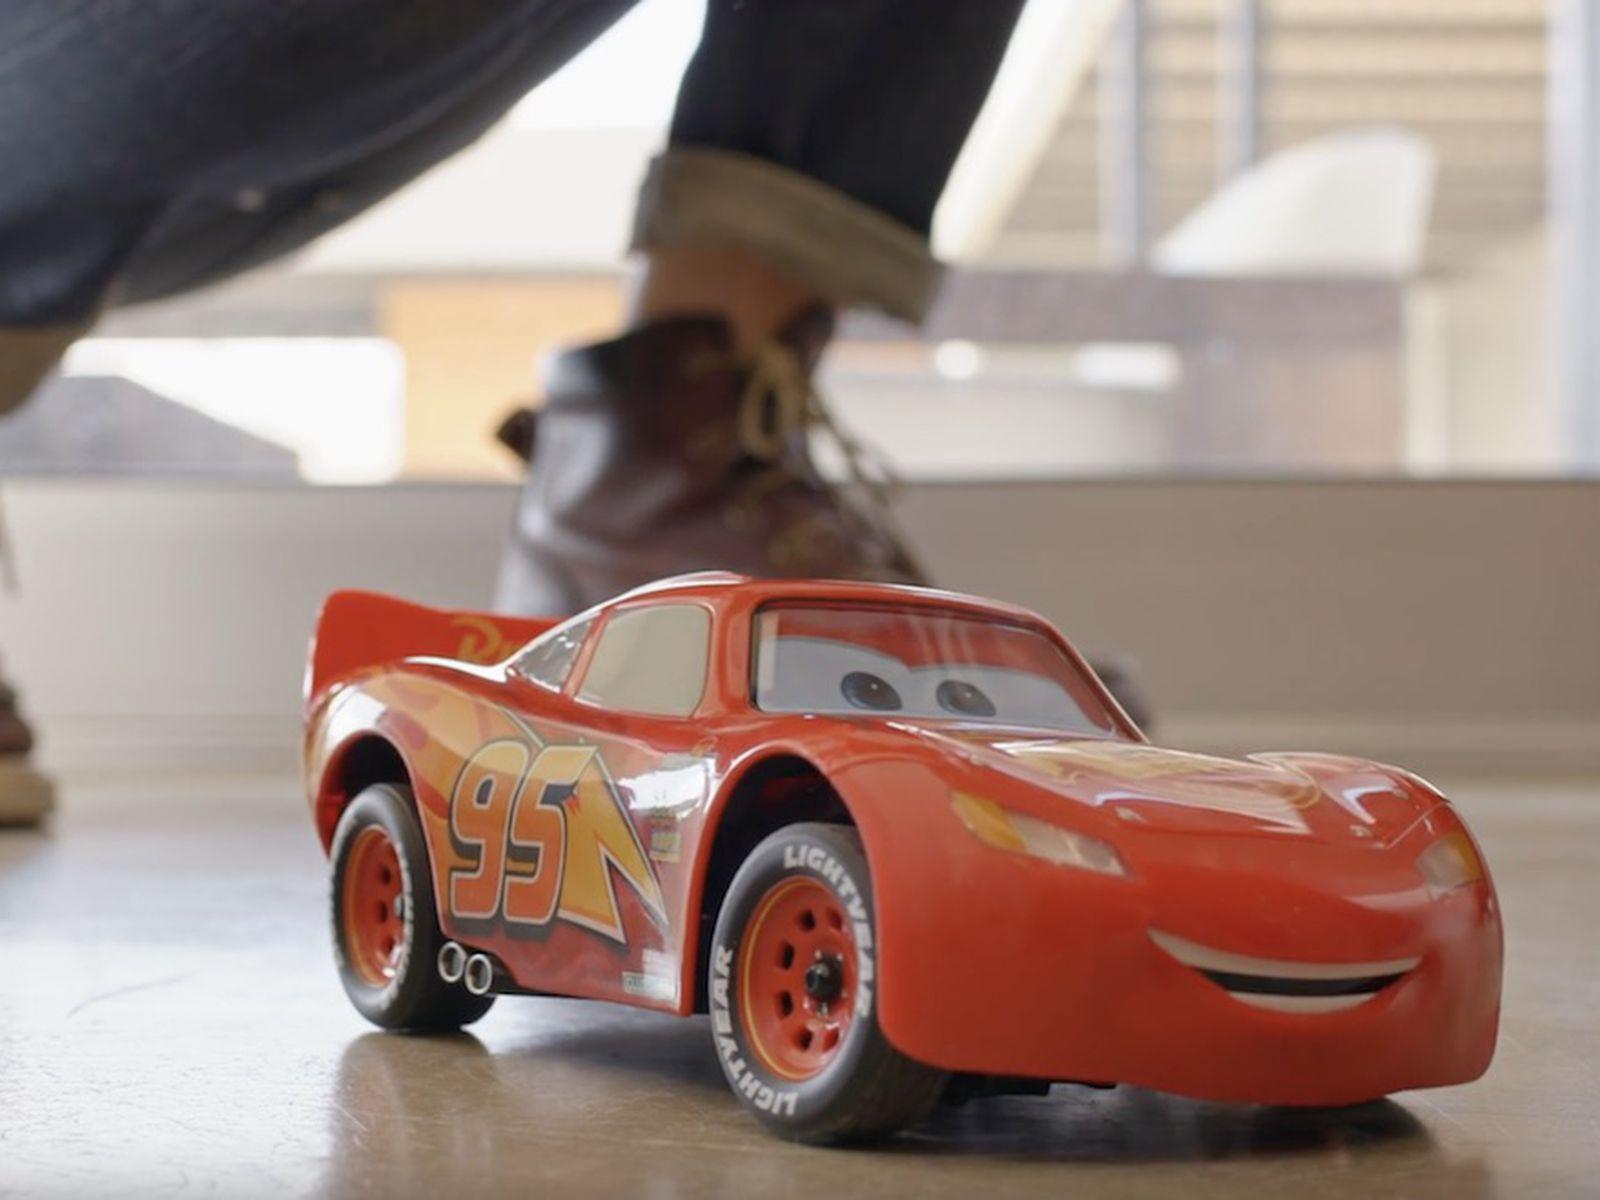 sphero launches 300 iphone controlled lightning mcqueen from disney pixar s cars macrumors iphone controlled lightning mcqueen